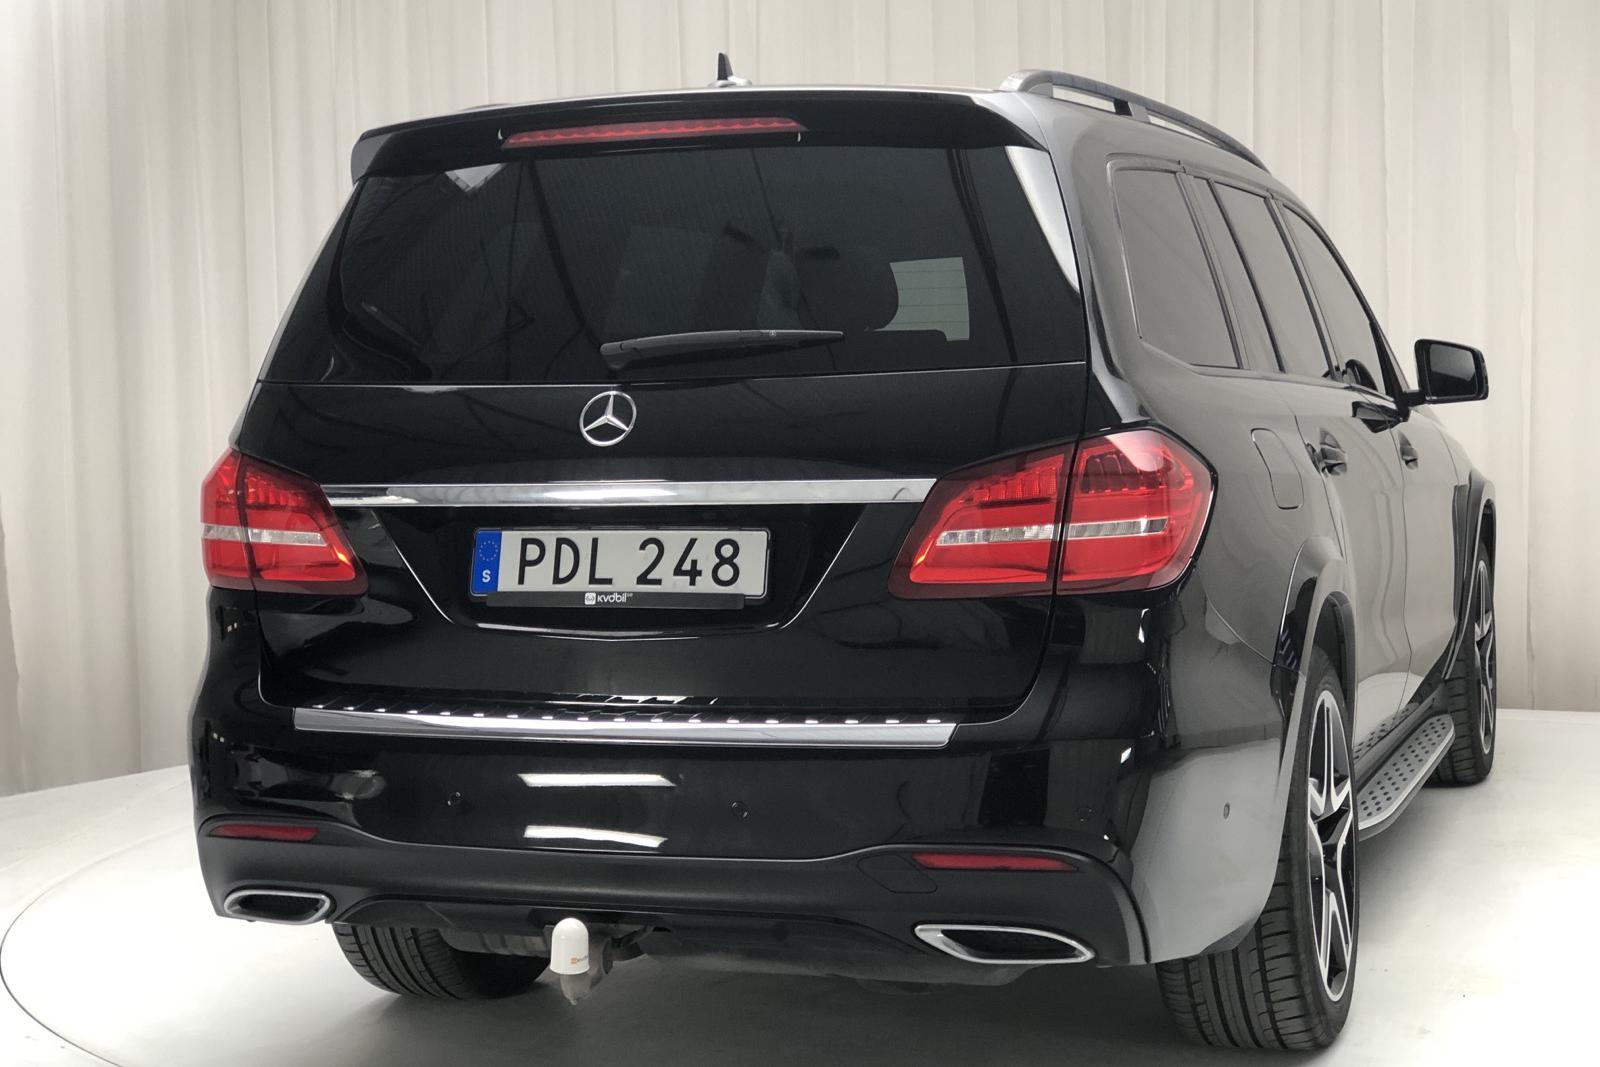 Mercedes GLS 350 d 4MATIC X166 (258hk) - 0 mil - svart - 2017